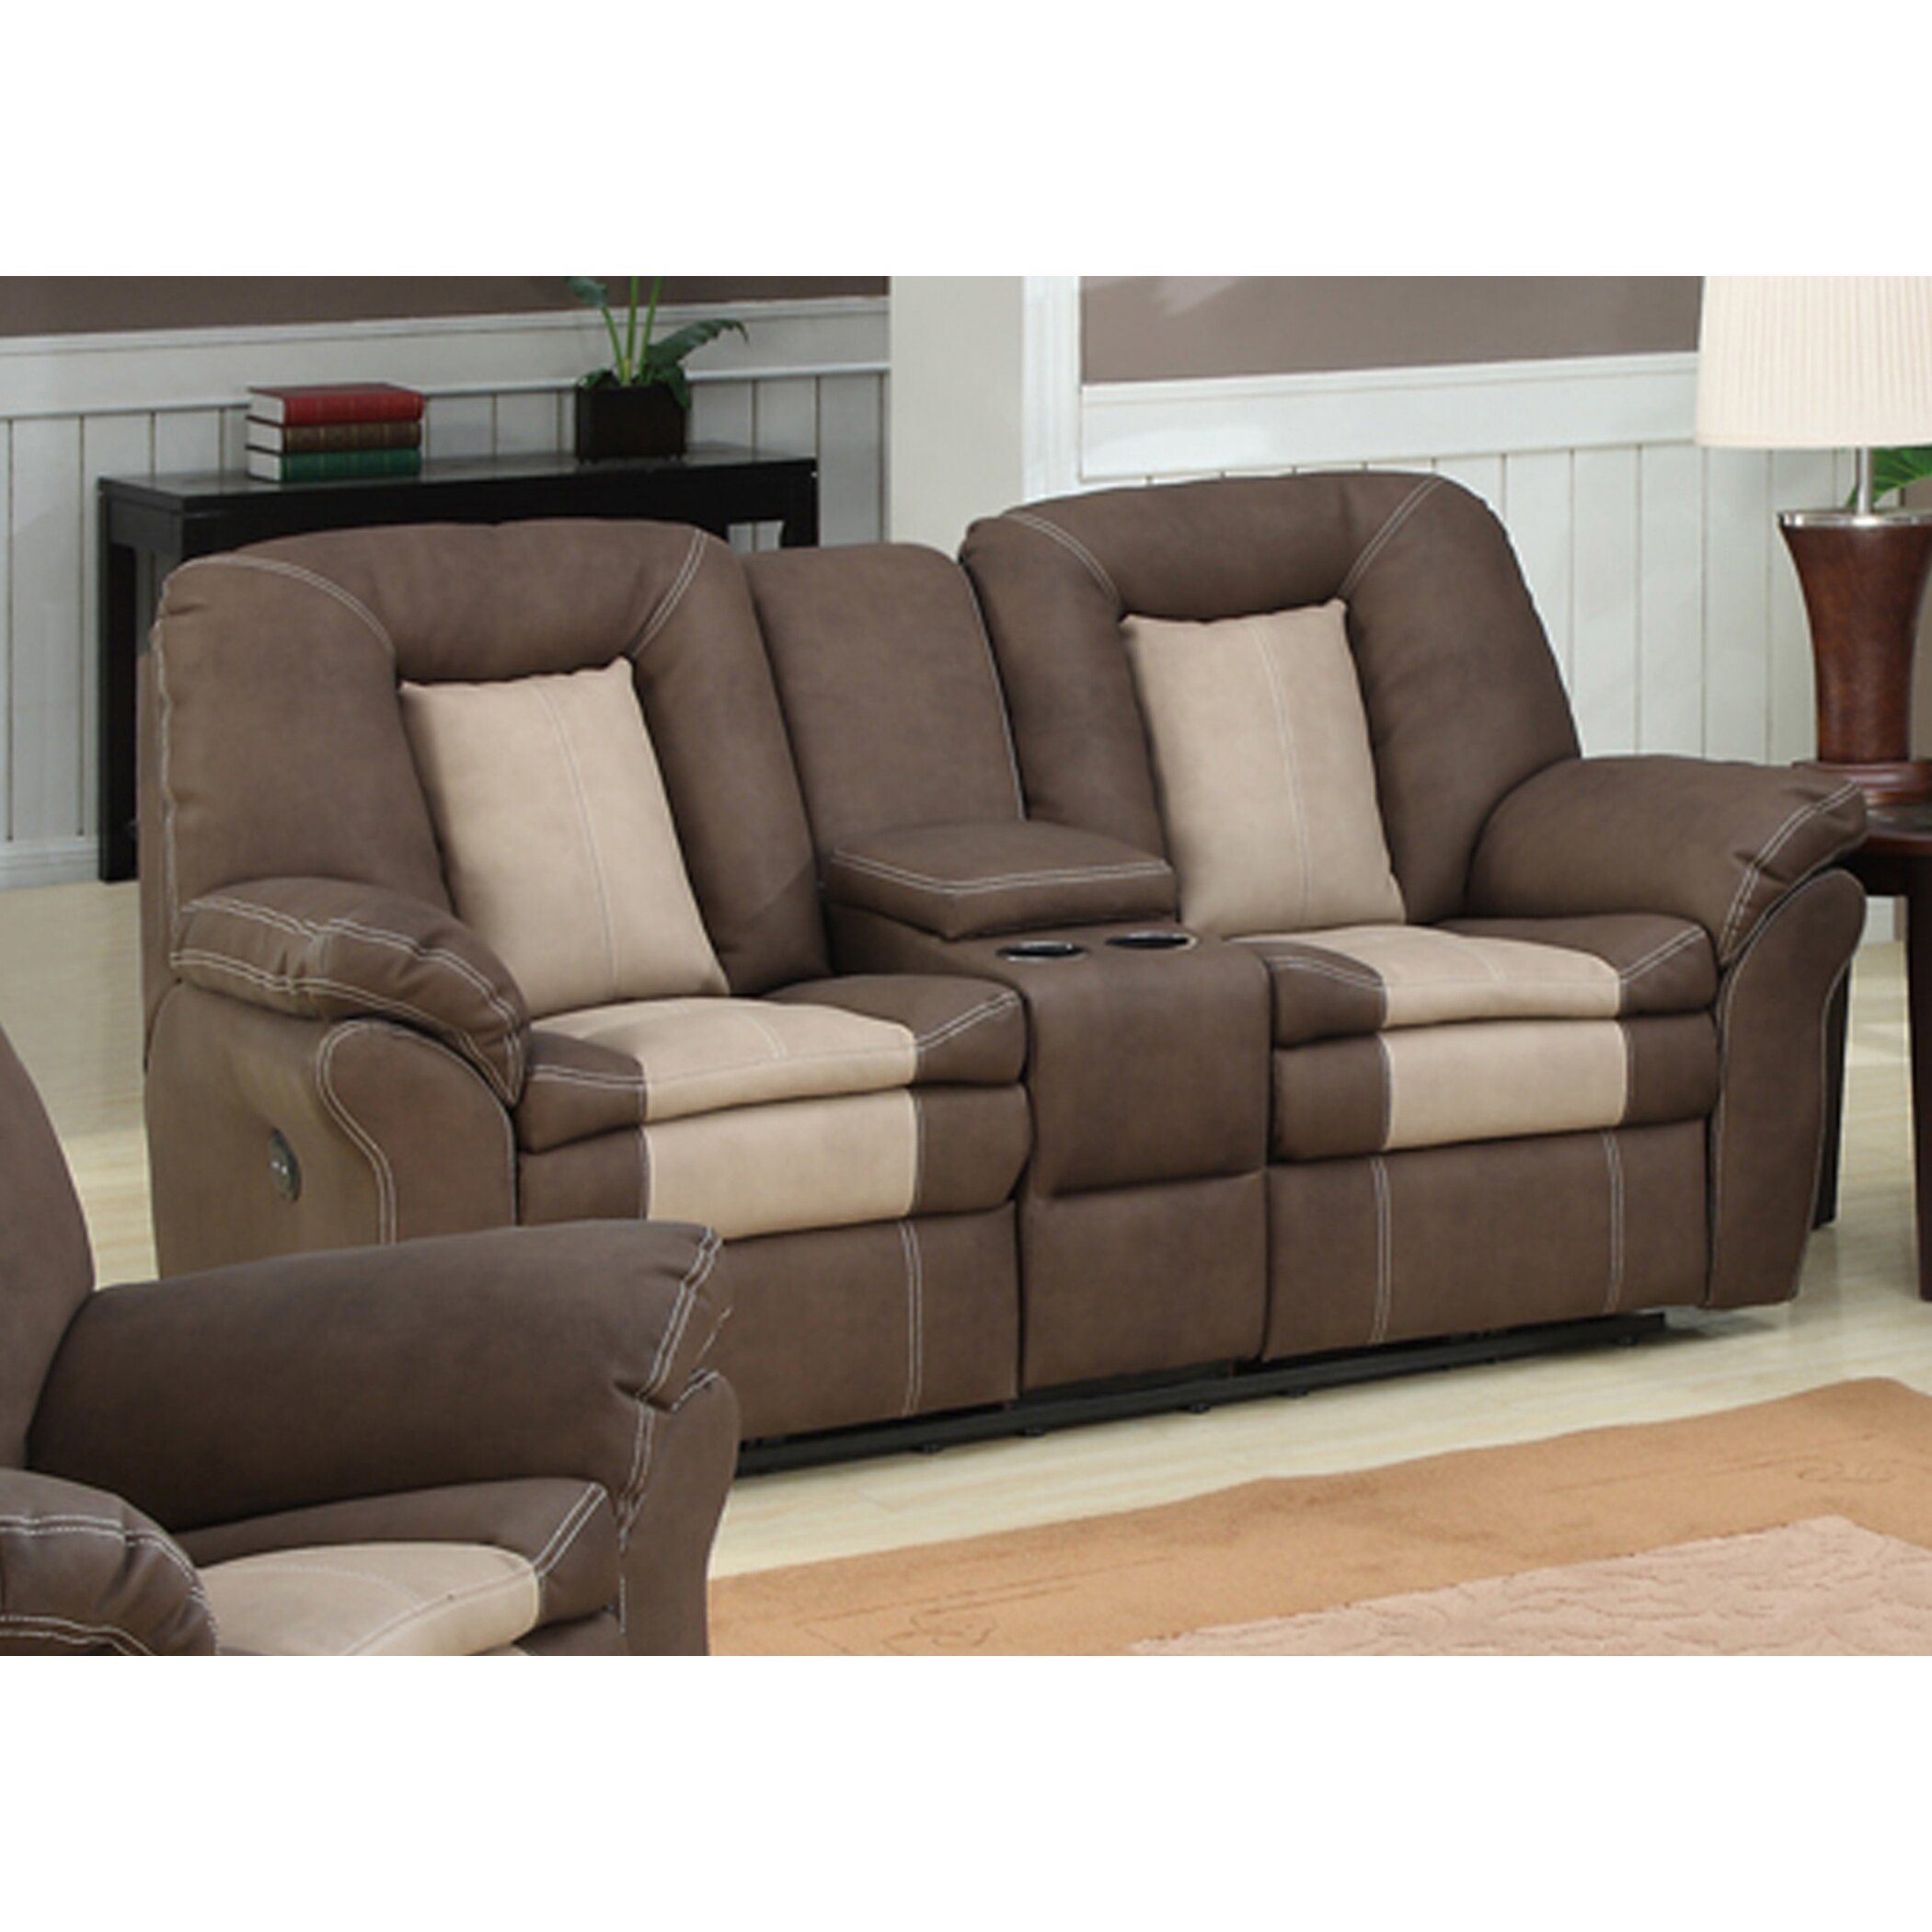 ac pacific carson 3 piece living room set & reviews | wayfair